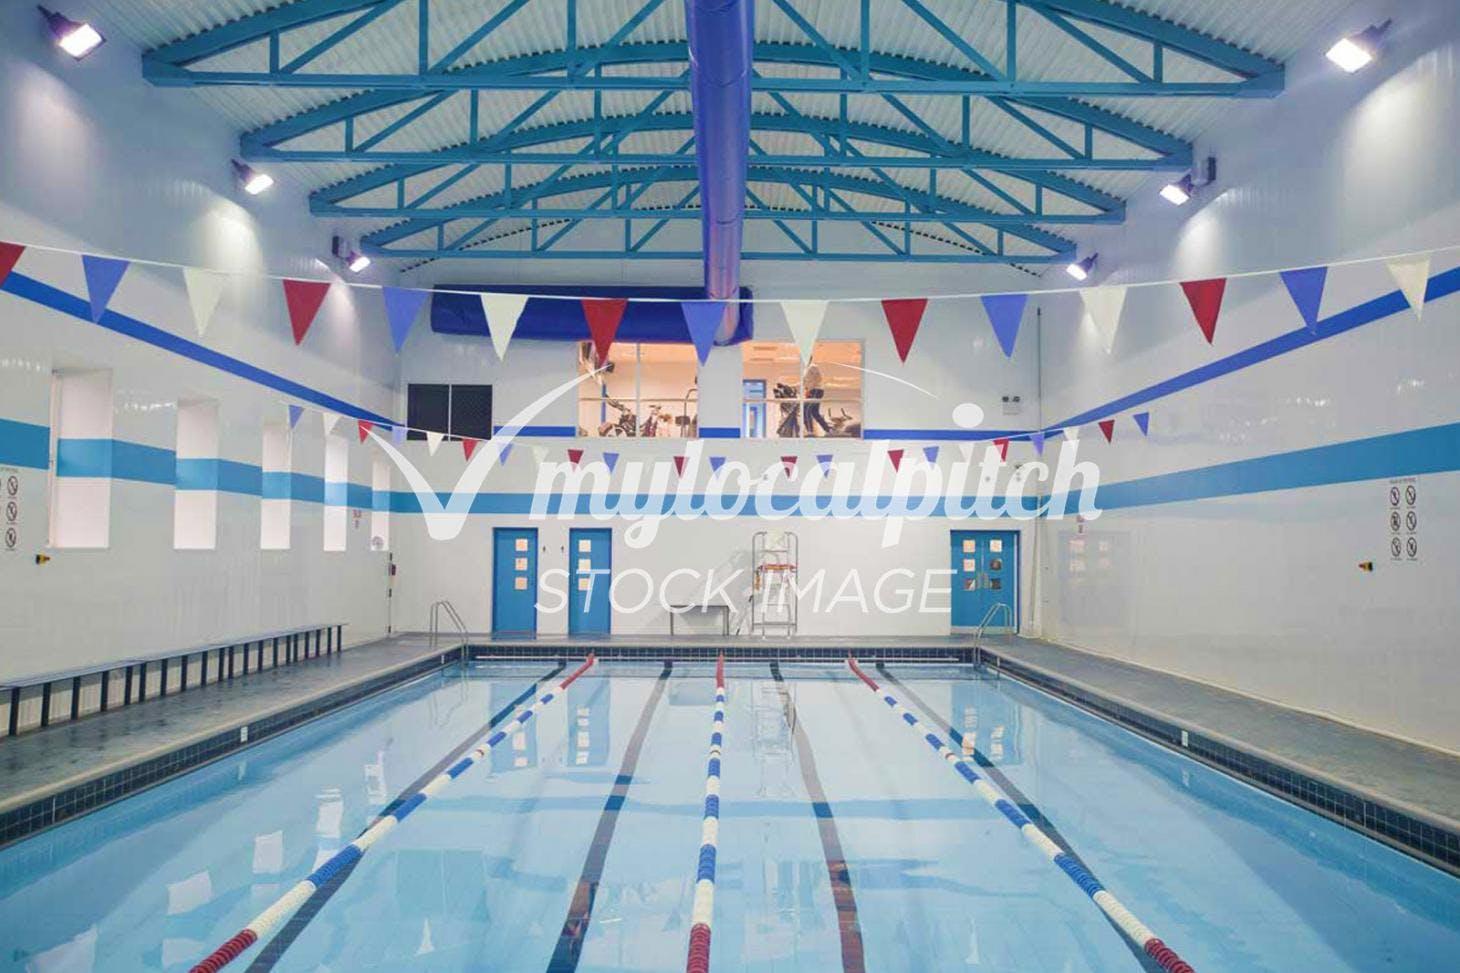 Phoenix Fitness Centre in Shepherds Bush Indoor swimming pool